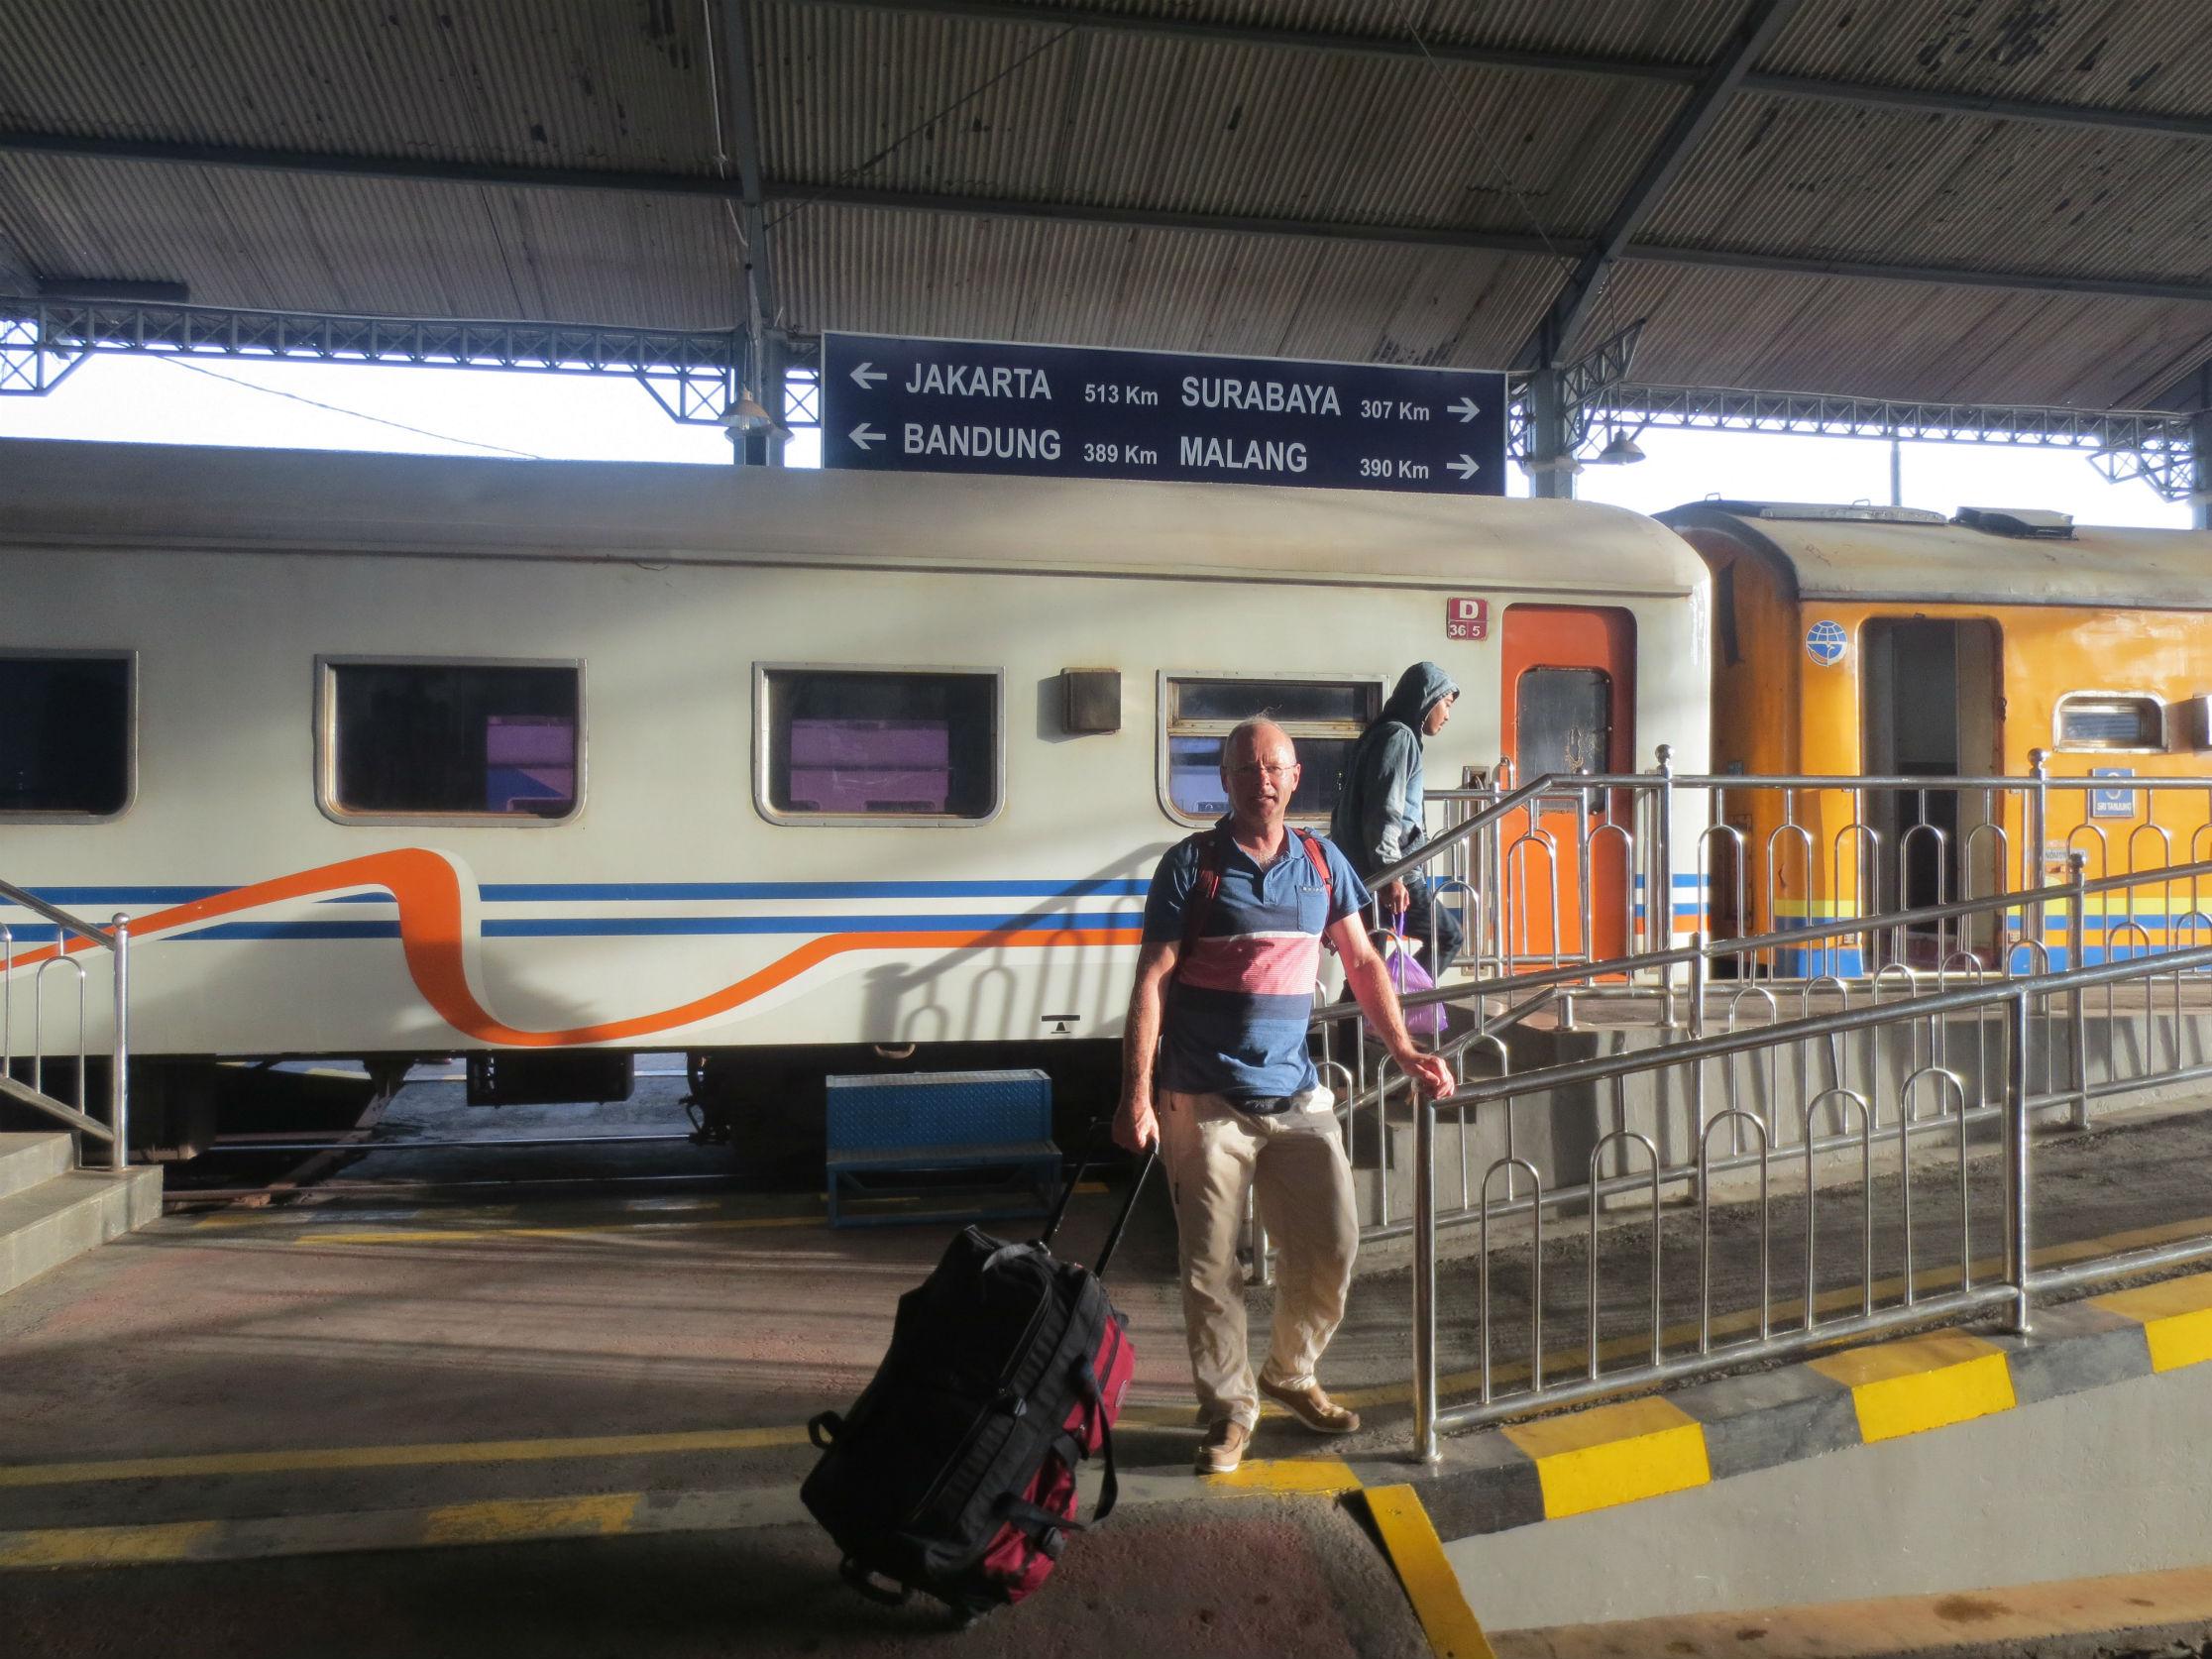 Yogyakarta Train Station